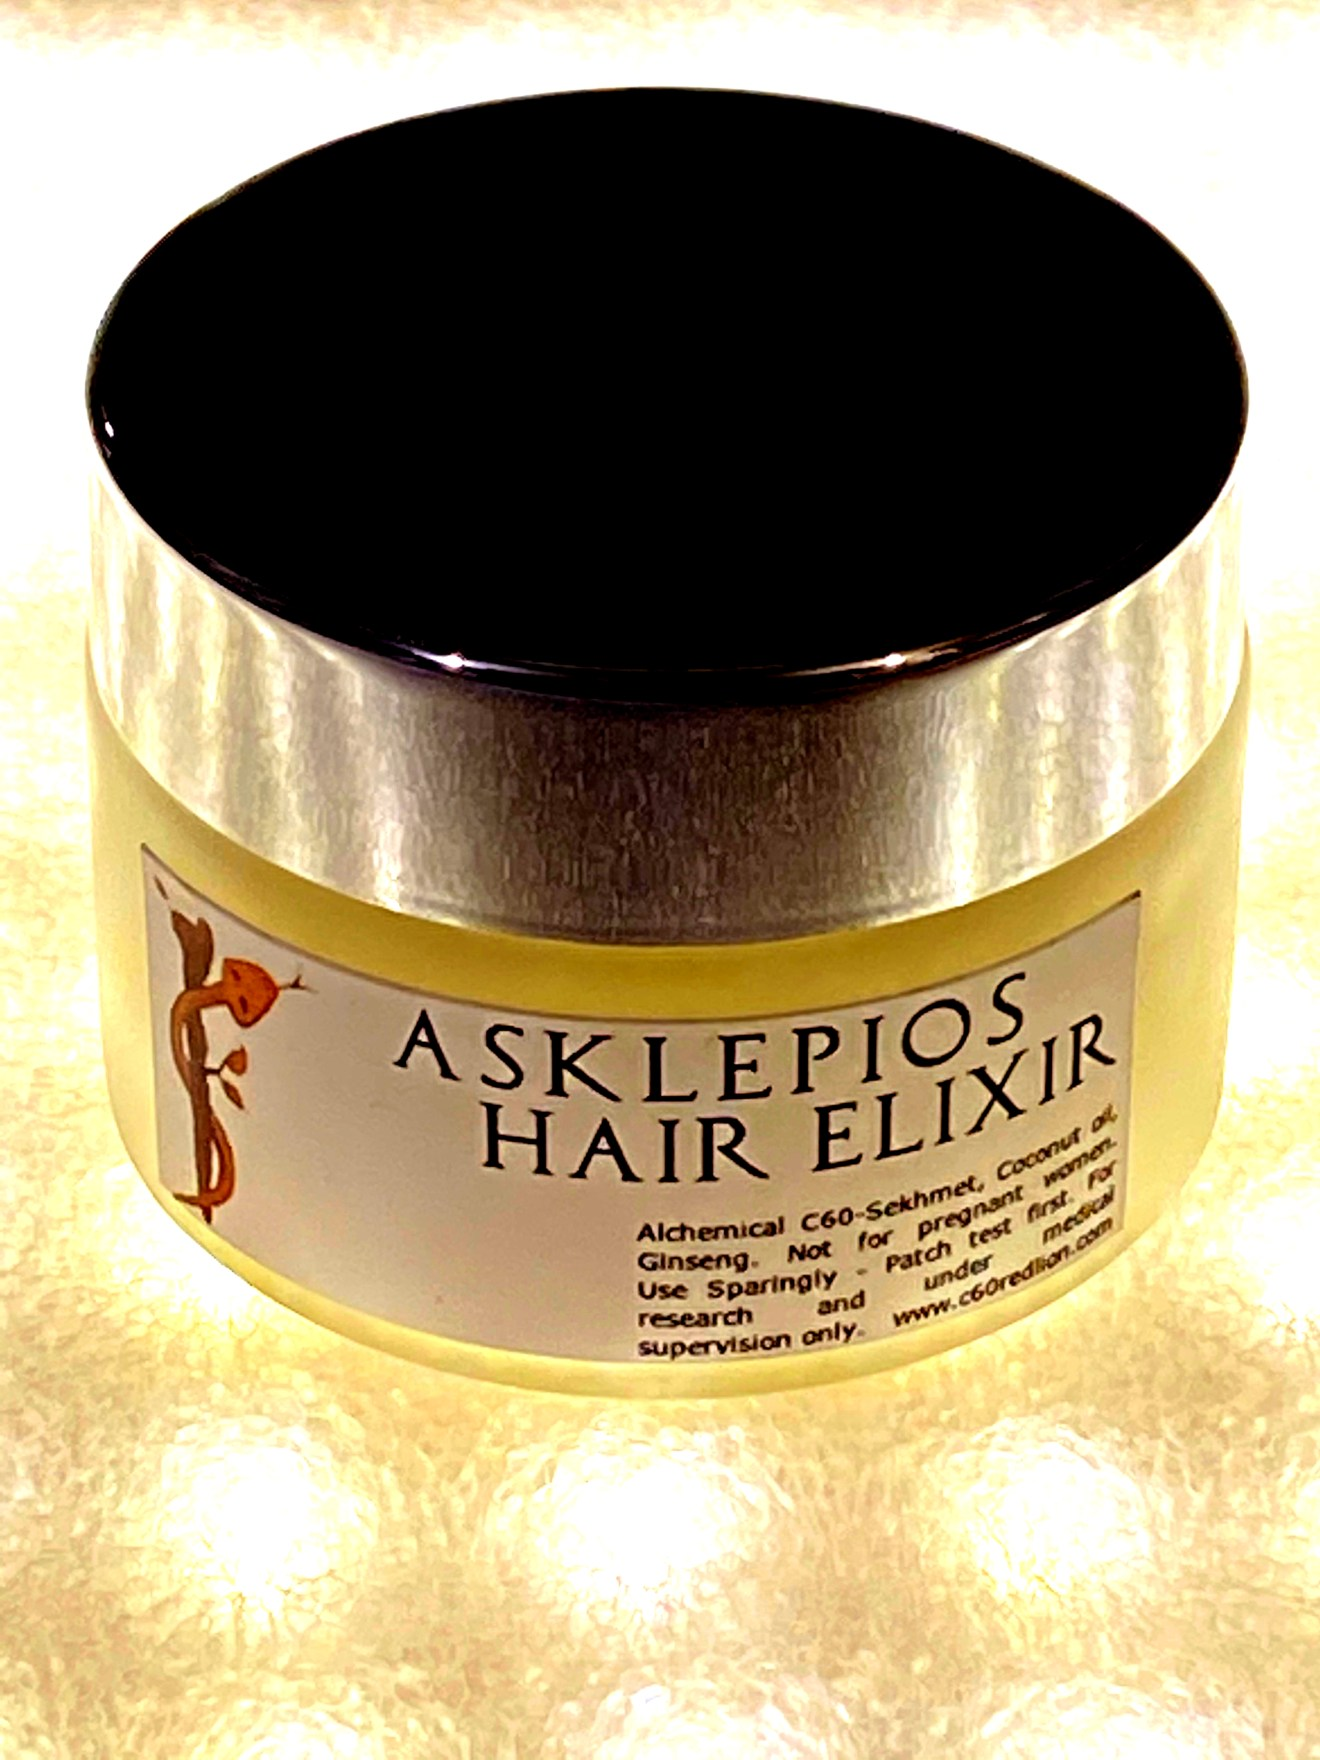 pic of hair elixir